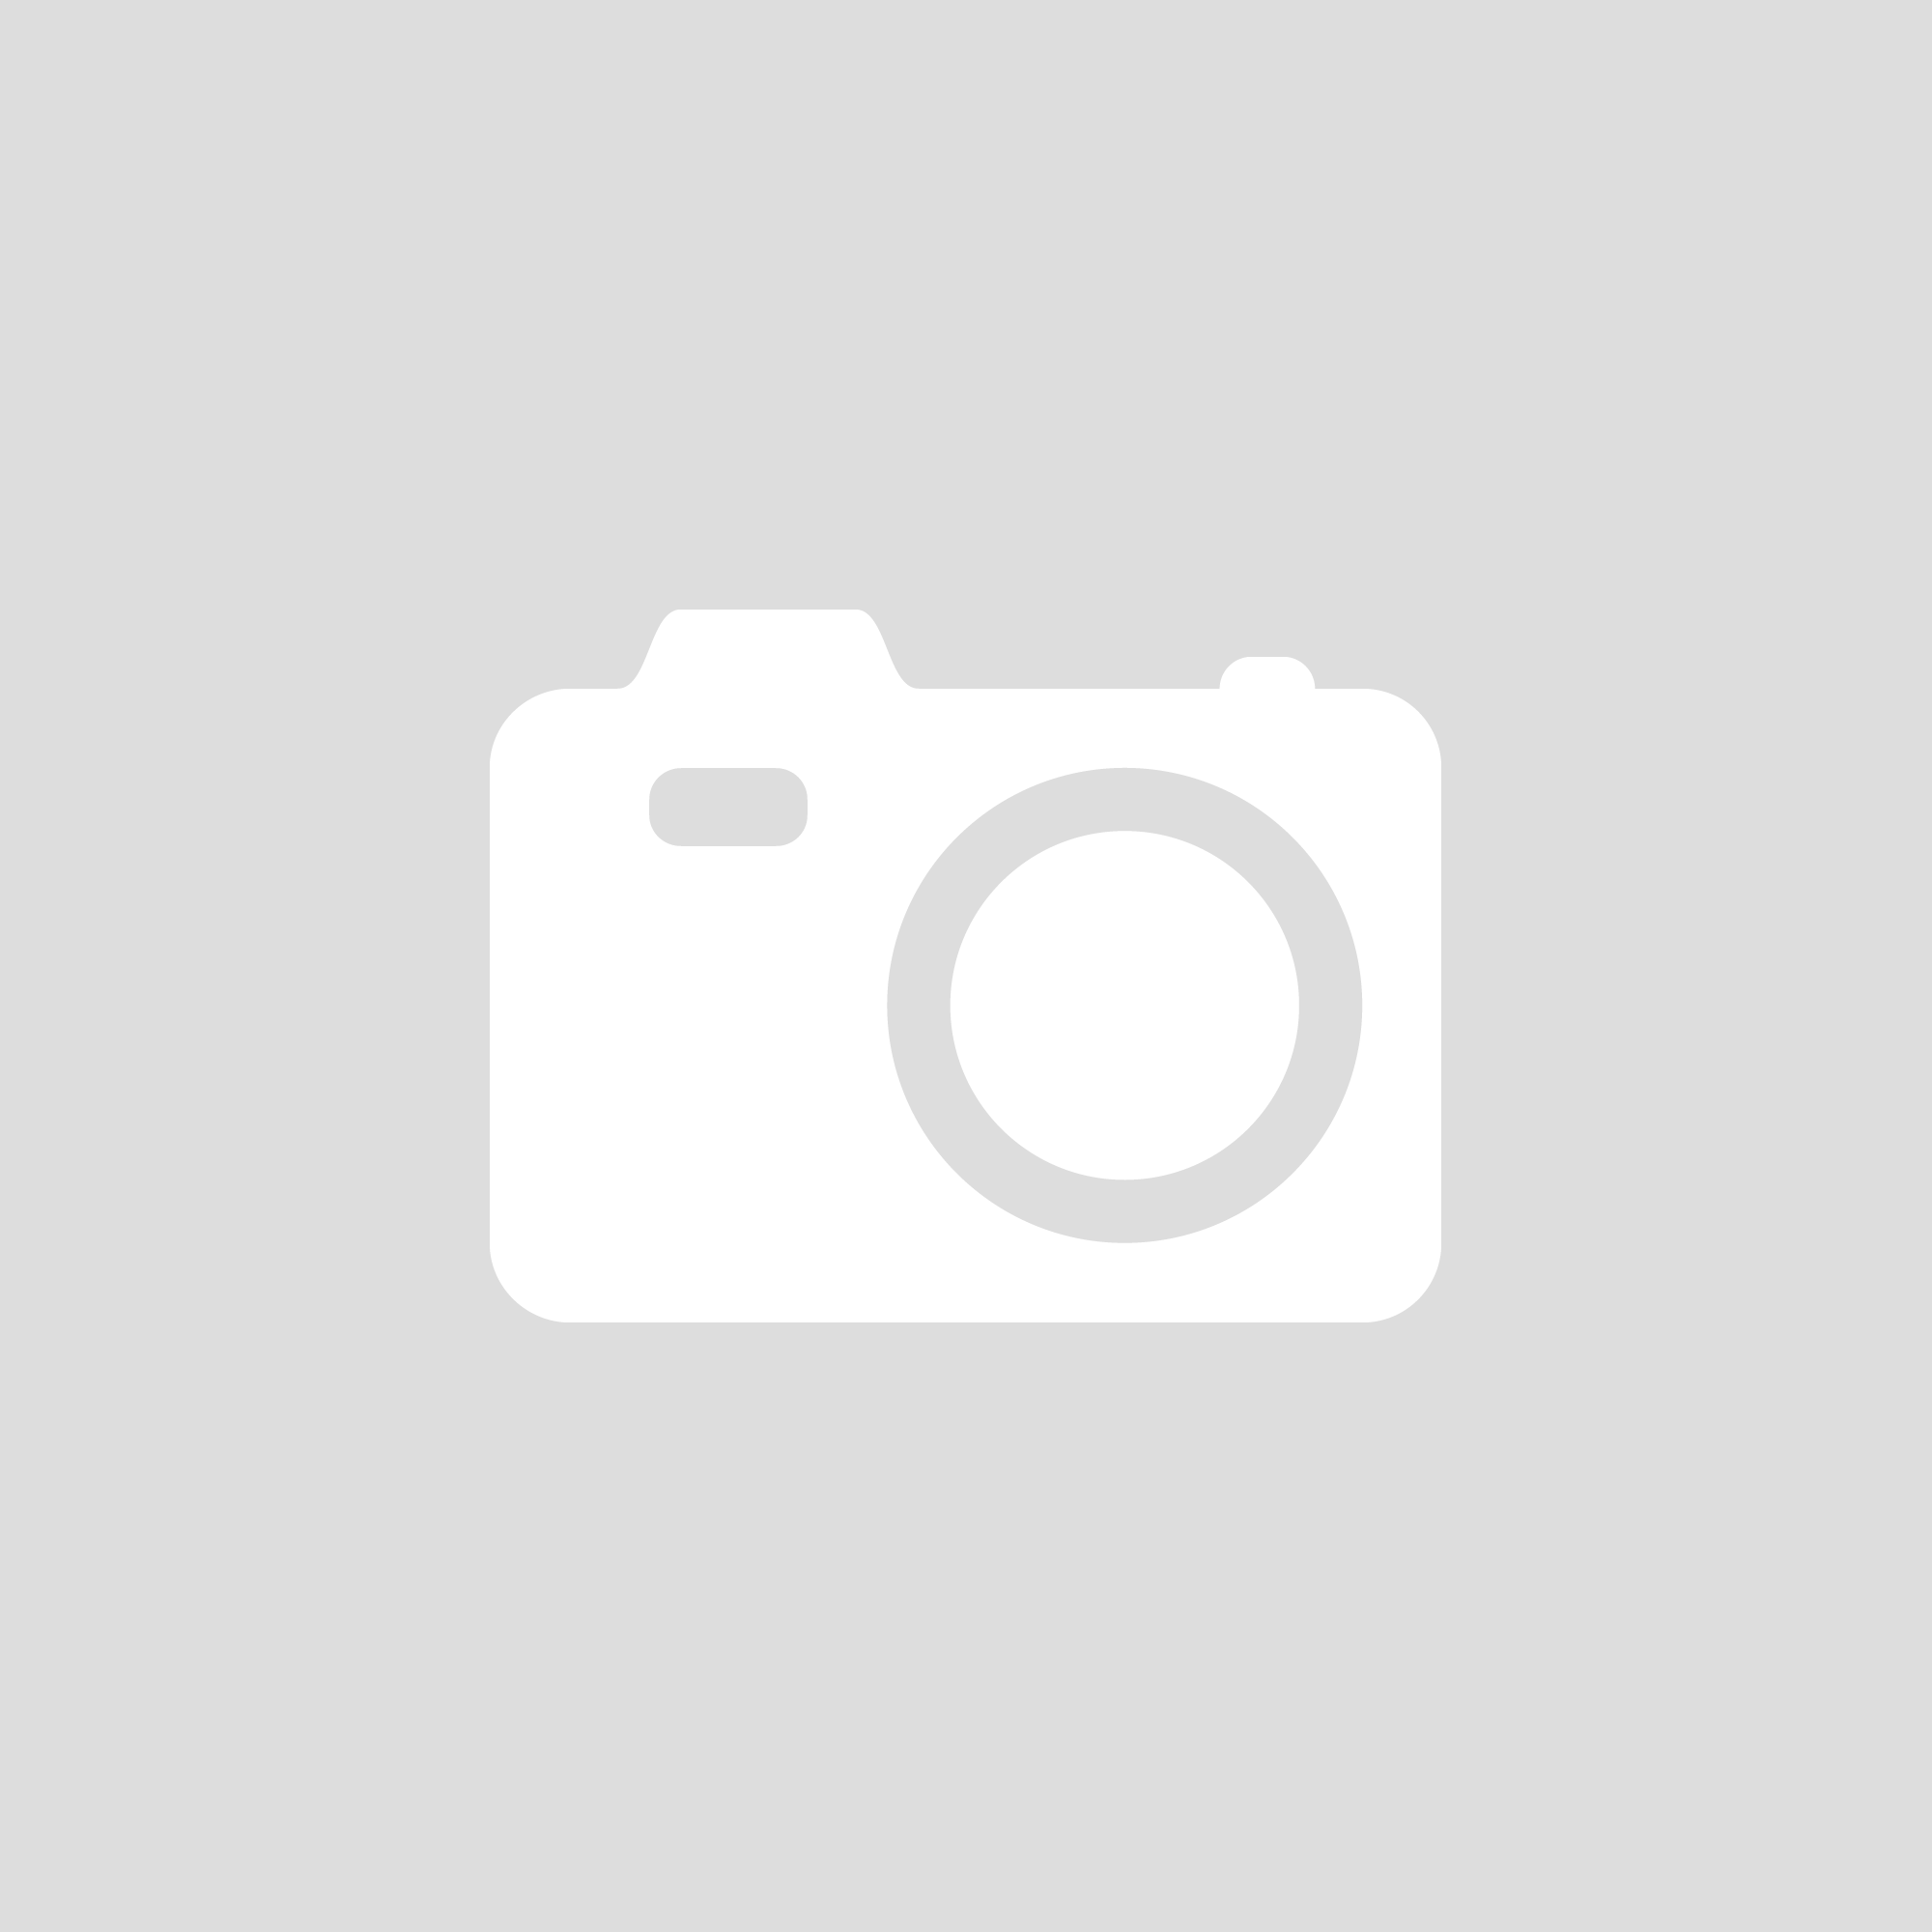 Tiffany Platinum Gold / Terracotta Wallpaper by Belgravia GB 162